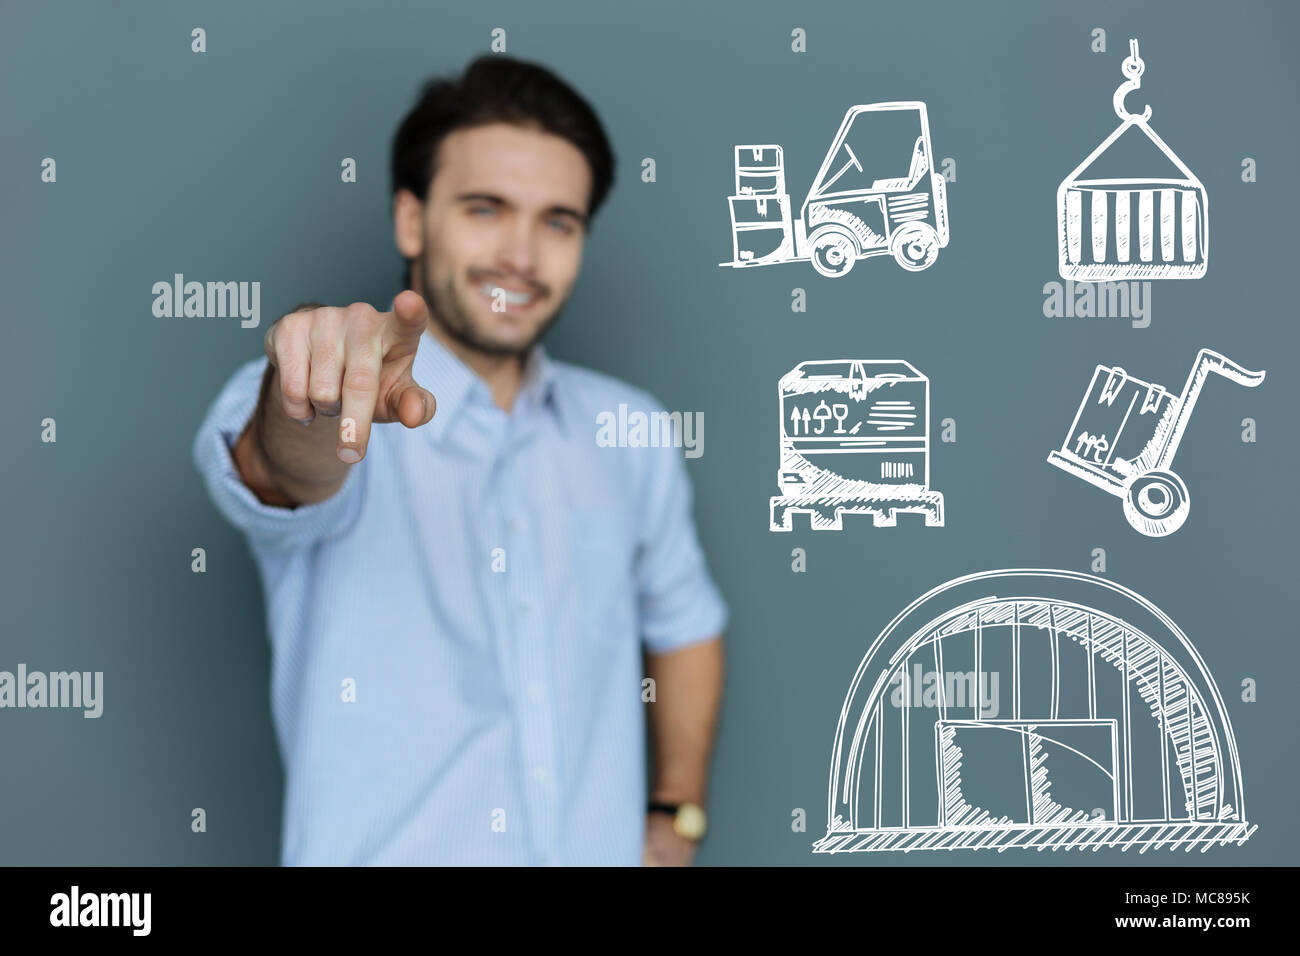 Cheerful laborer smiling and enjoying his hard work - Stock Image